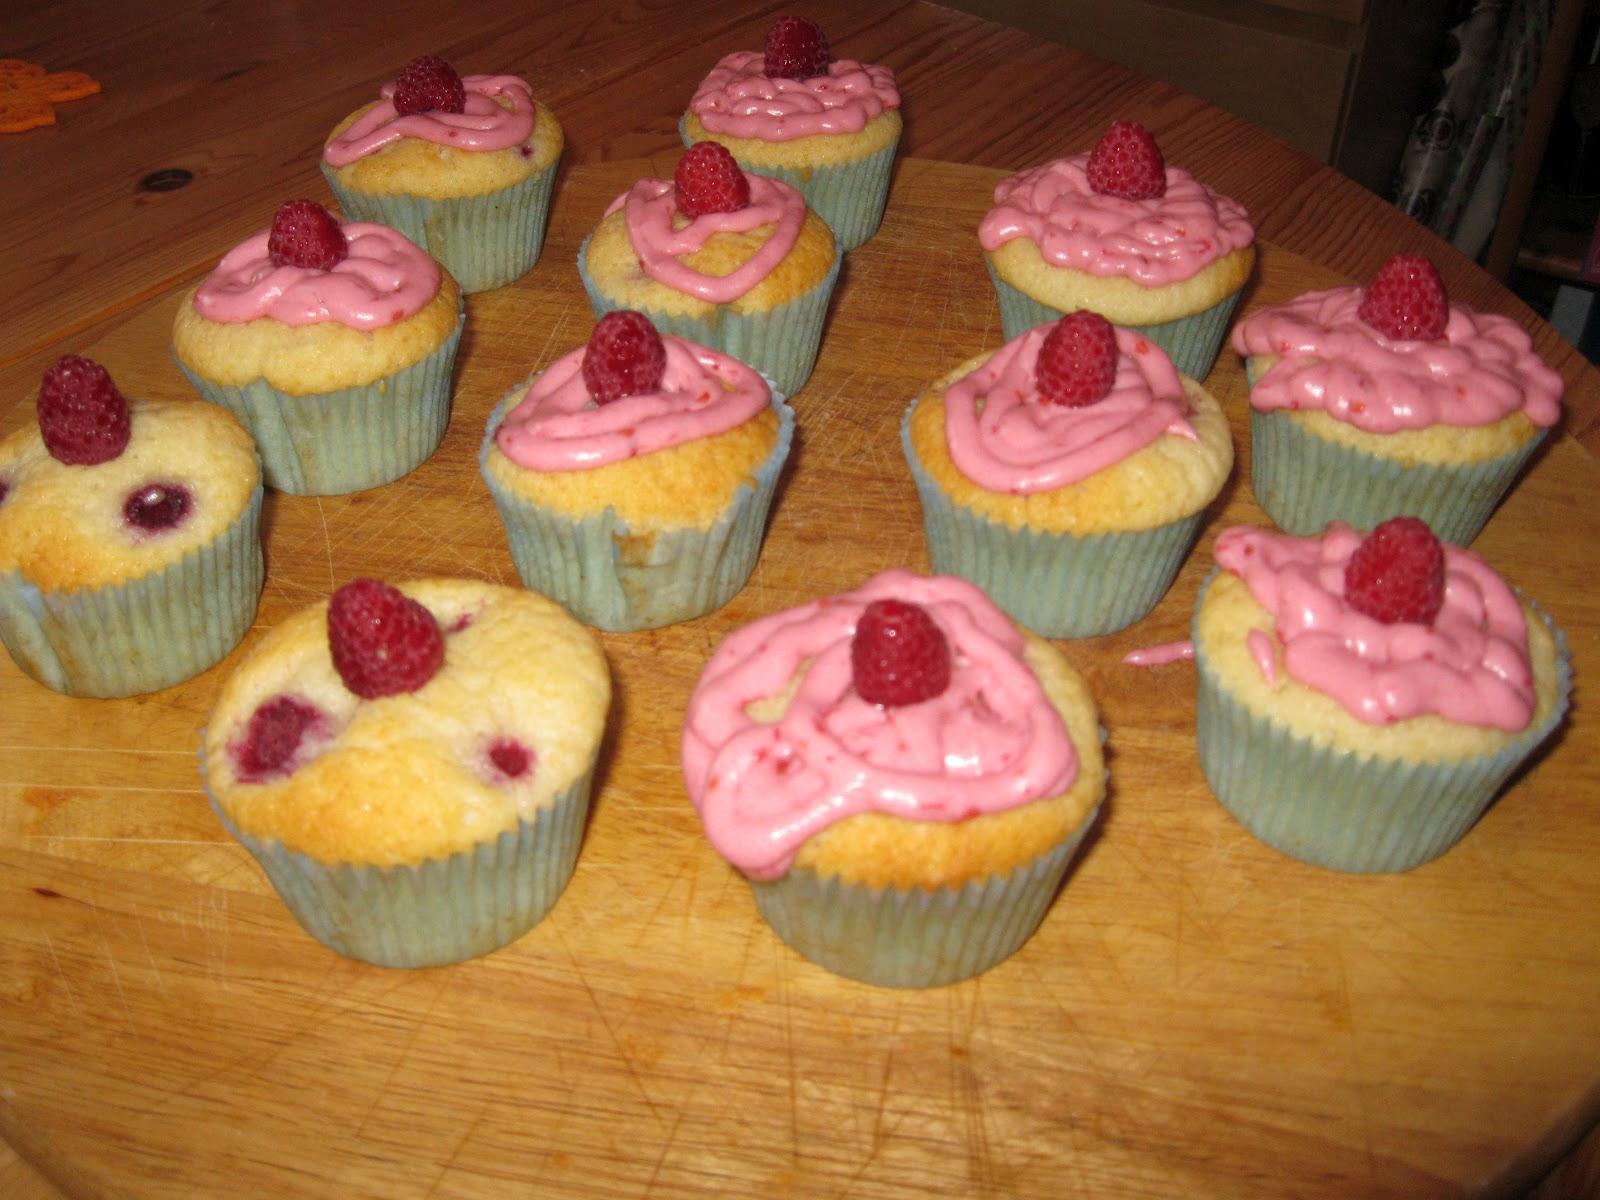 backen leicht gemacht himbeer joghurt muffins. Black Bedroom Furniture Sets. Home Design Ideas